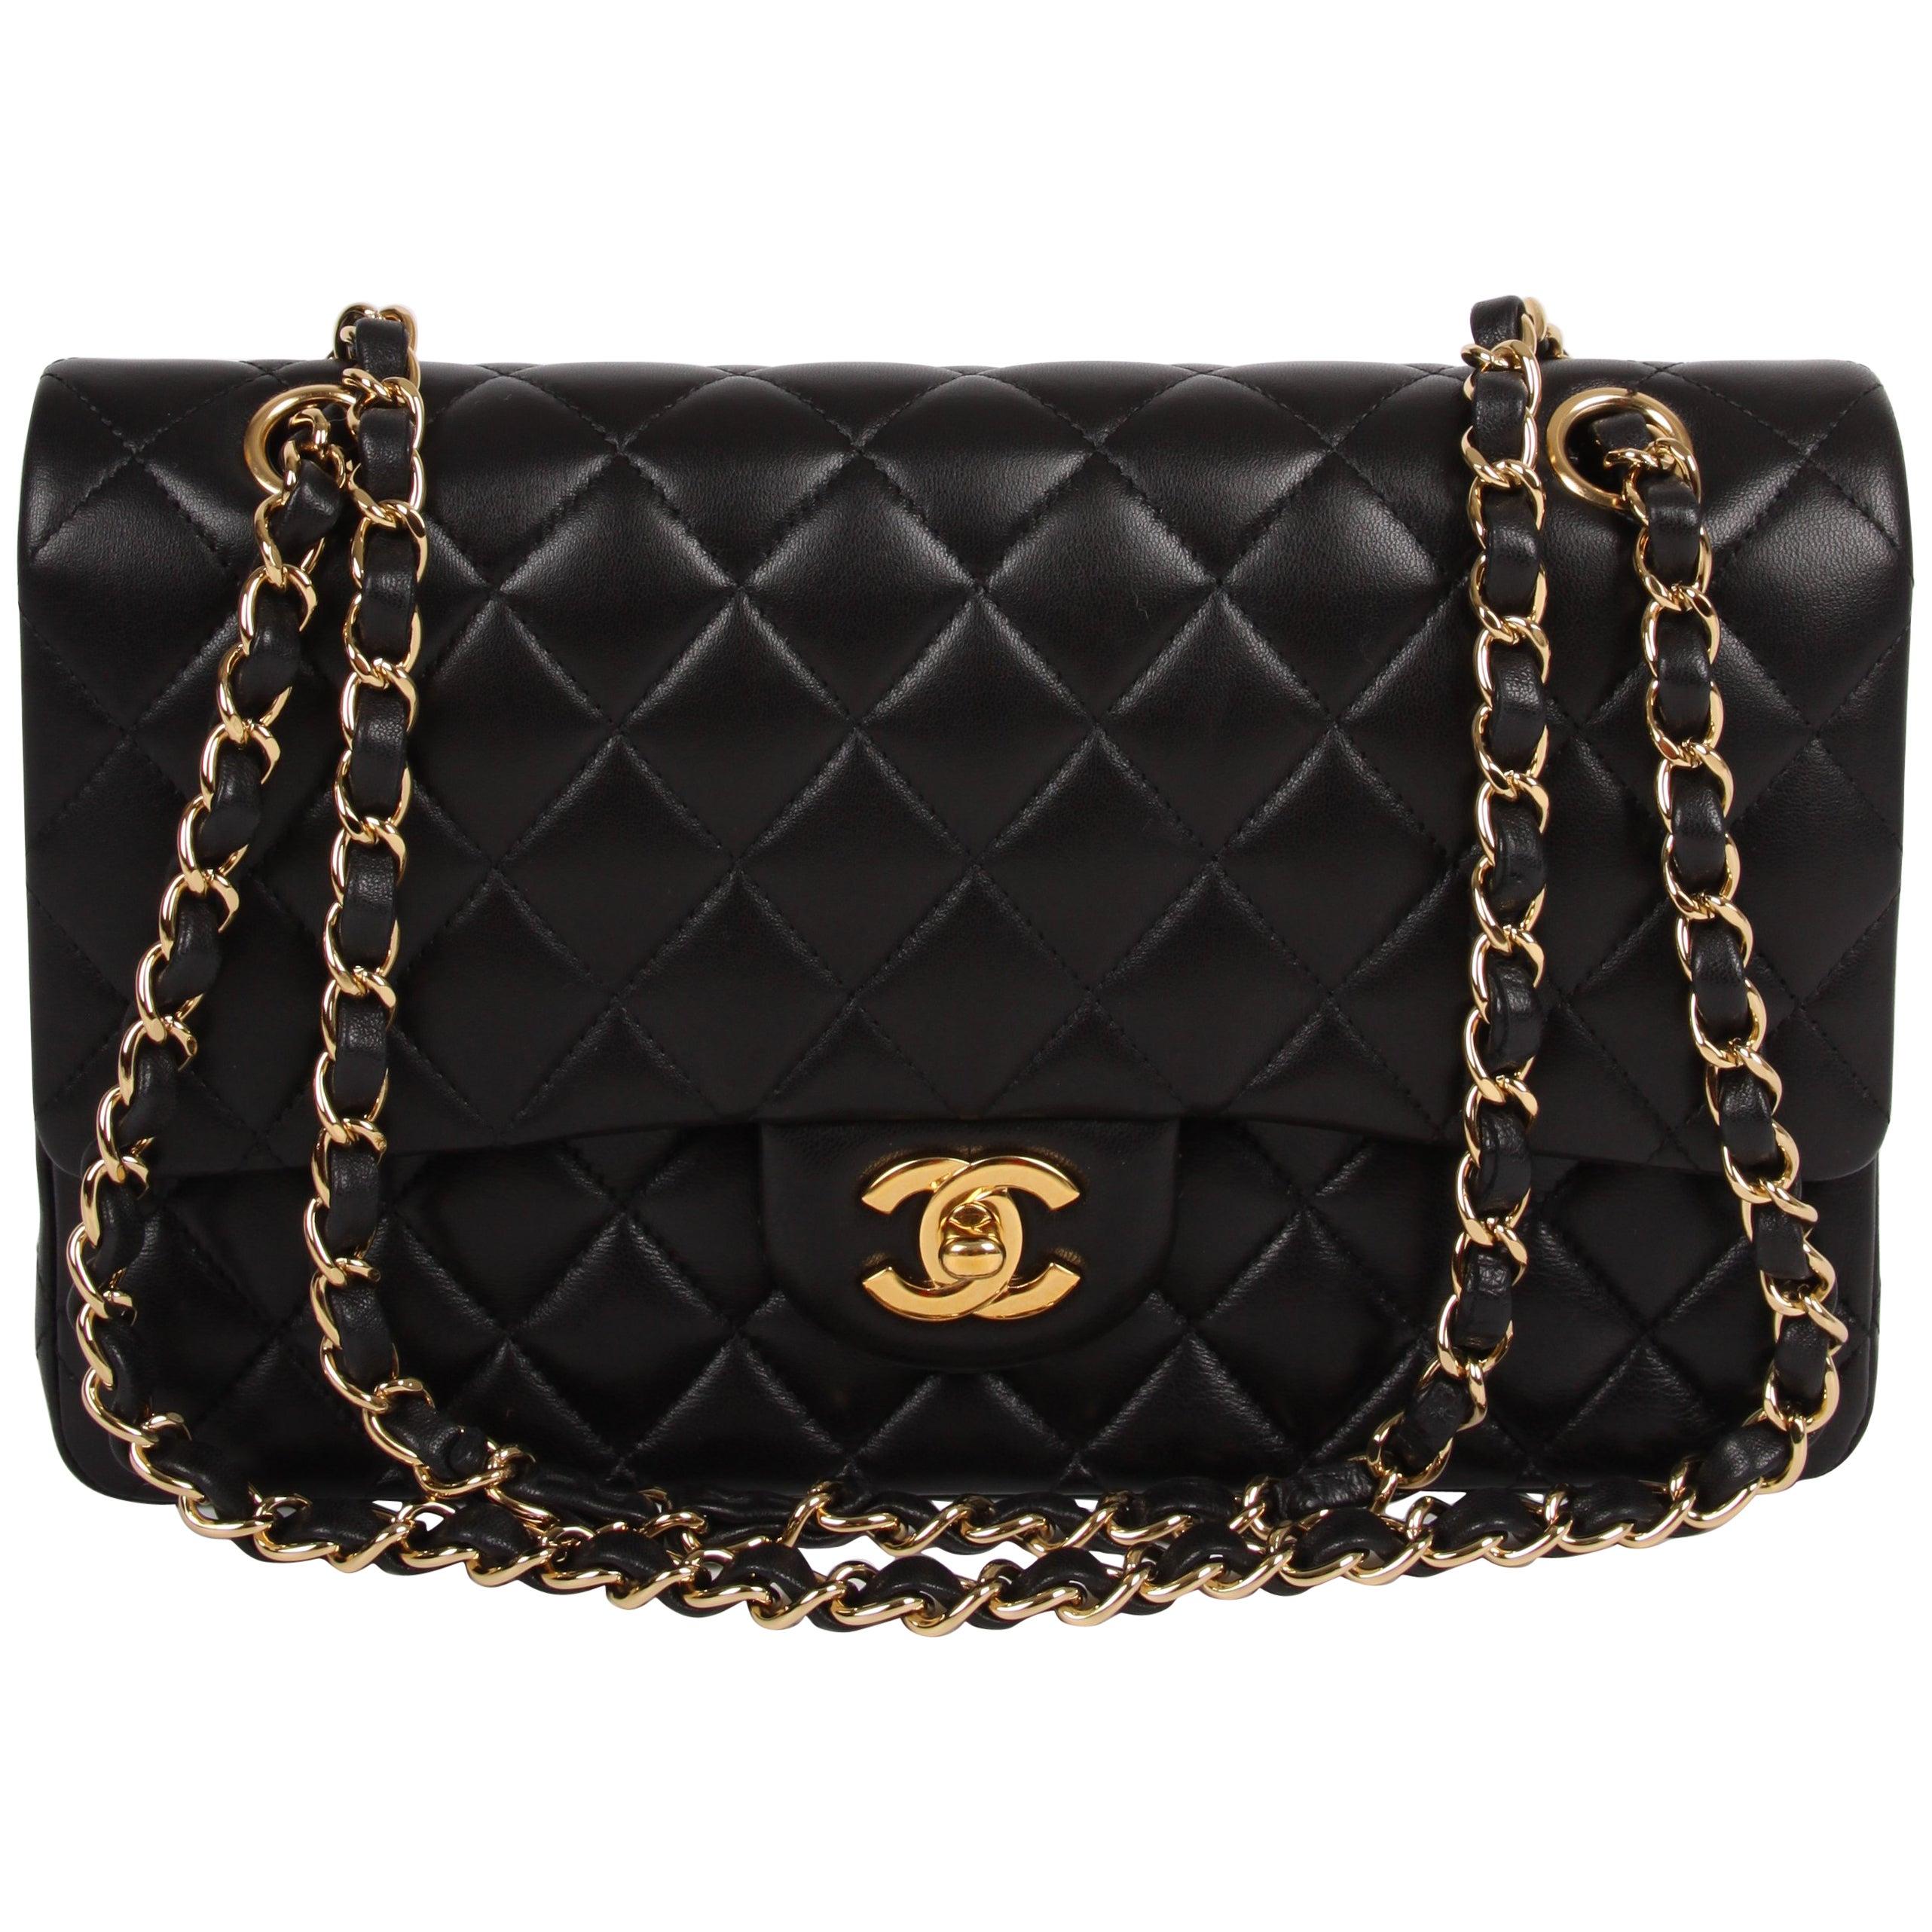 015bacb8fb9c Chanel 2.55 Medium Classic Double Flap Bag - black/gold at 1stdibs